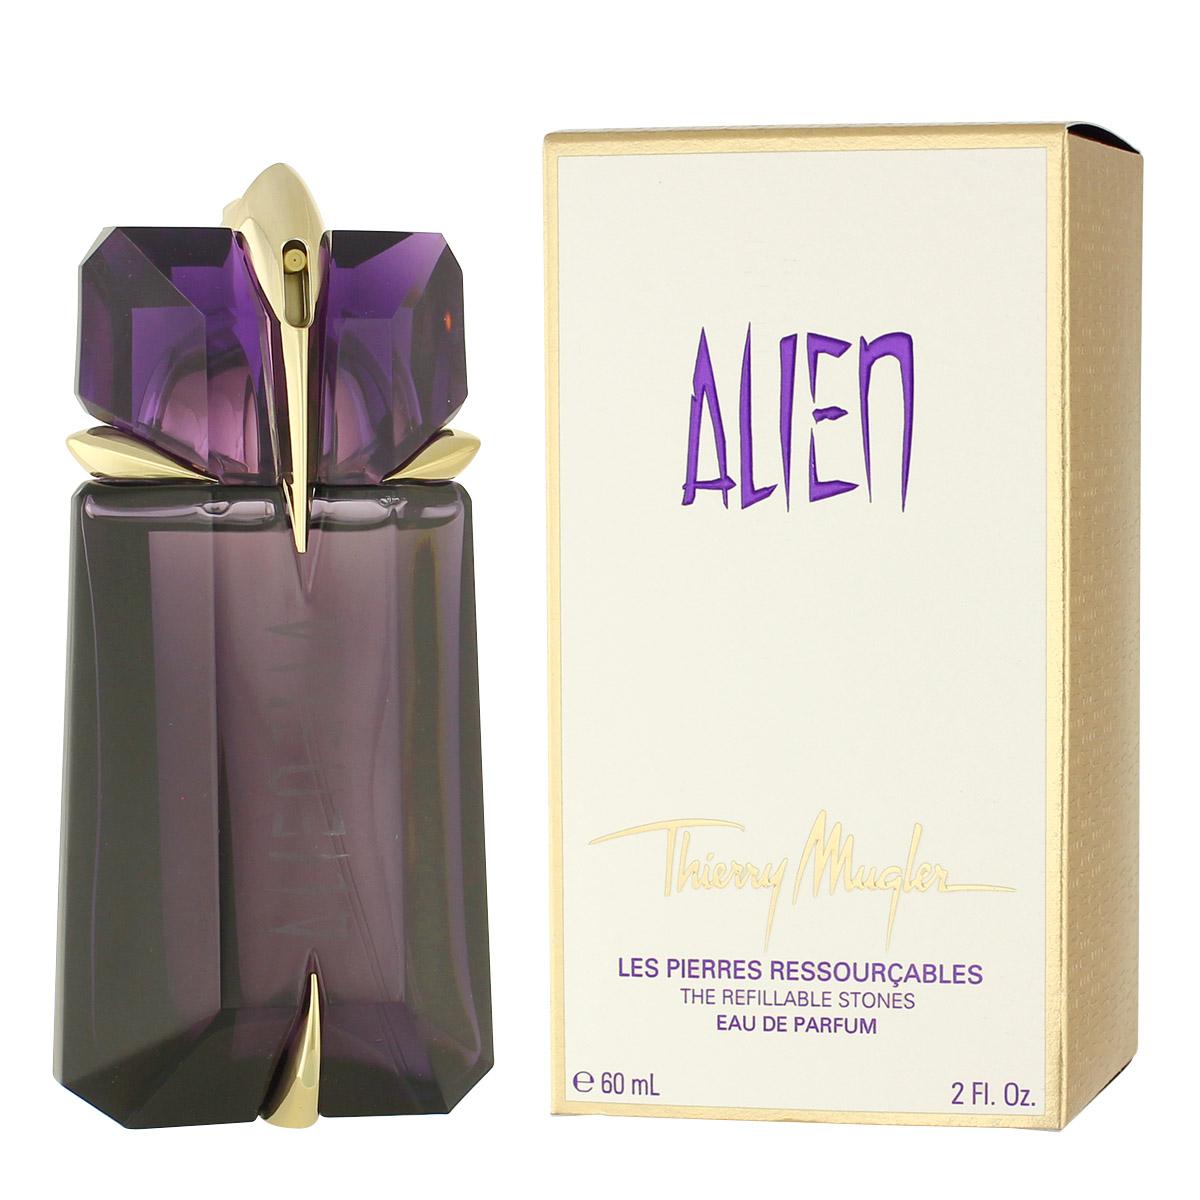 Thierry Mugler Alien EDP plnitelný 60 ml W